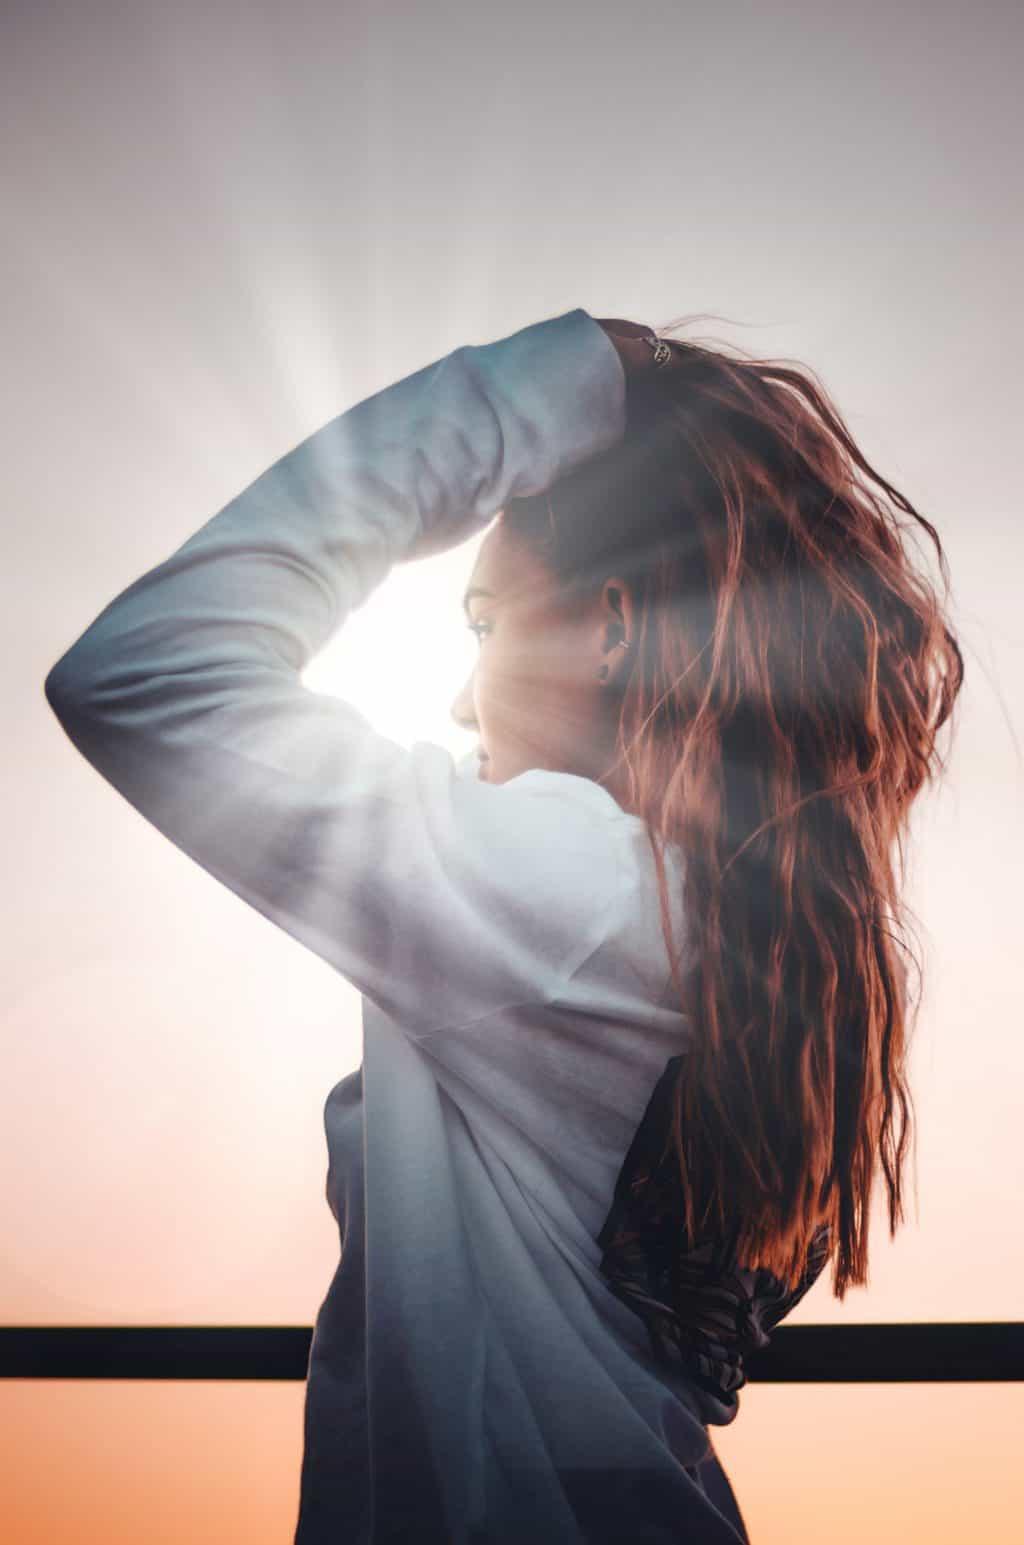 girl holding her hair up